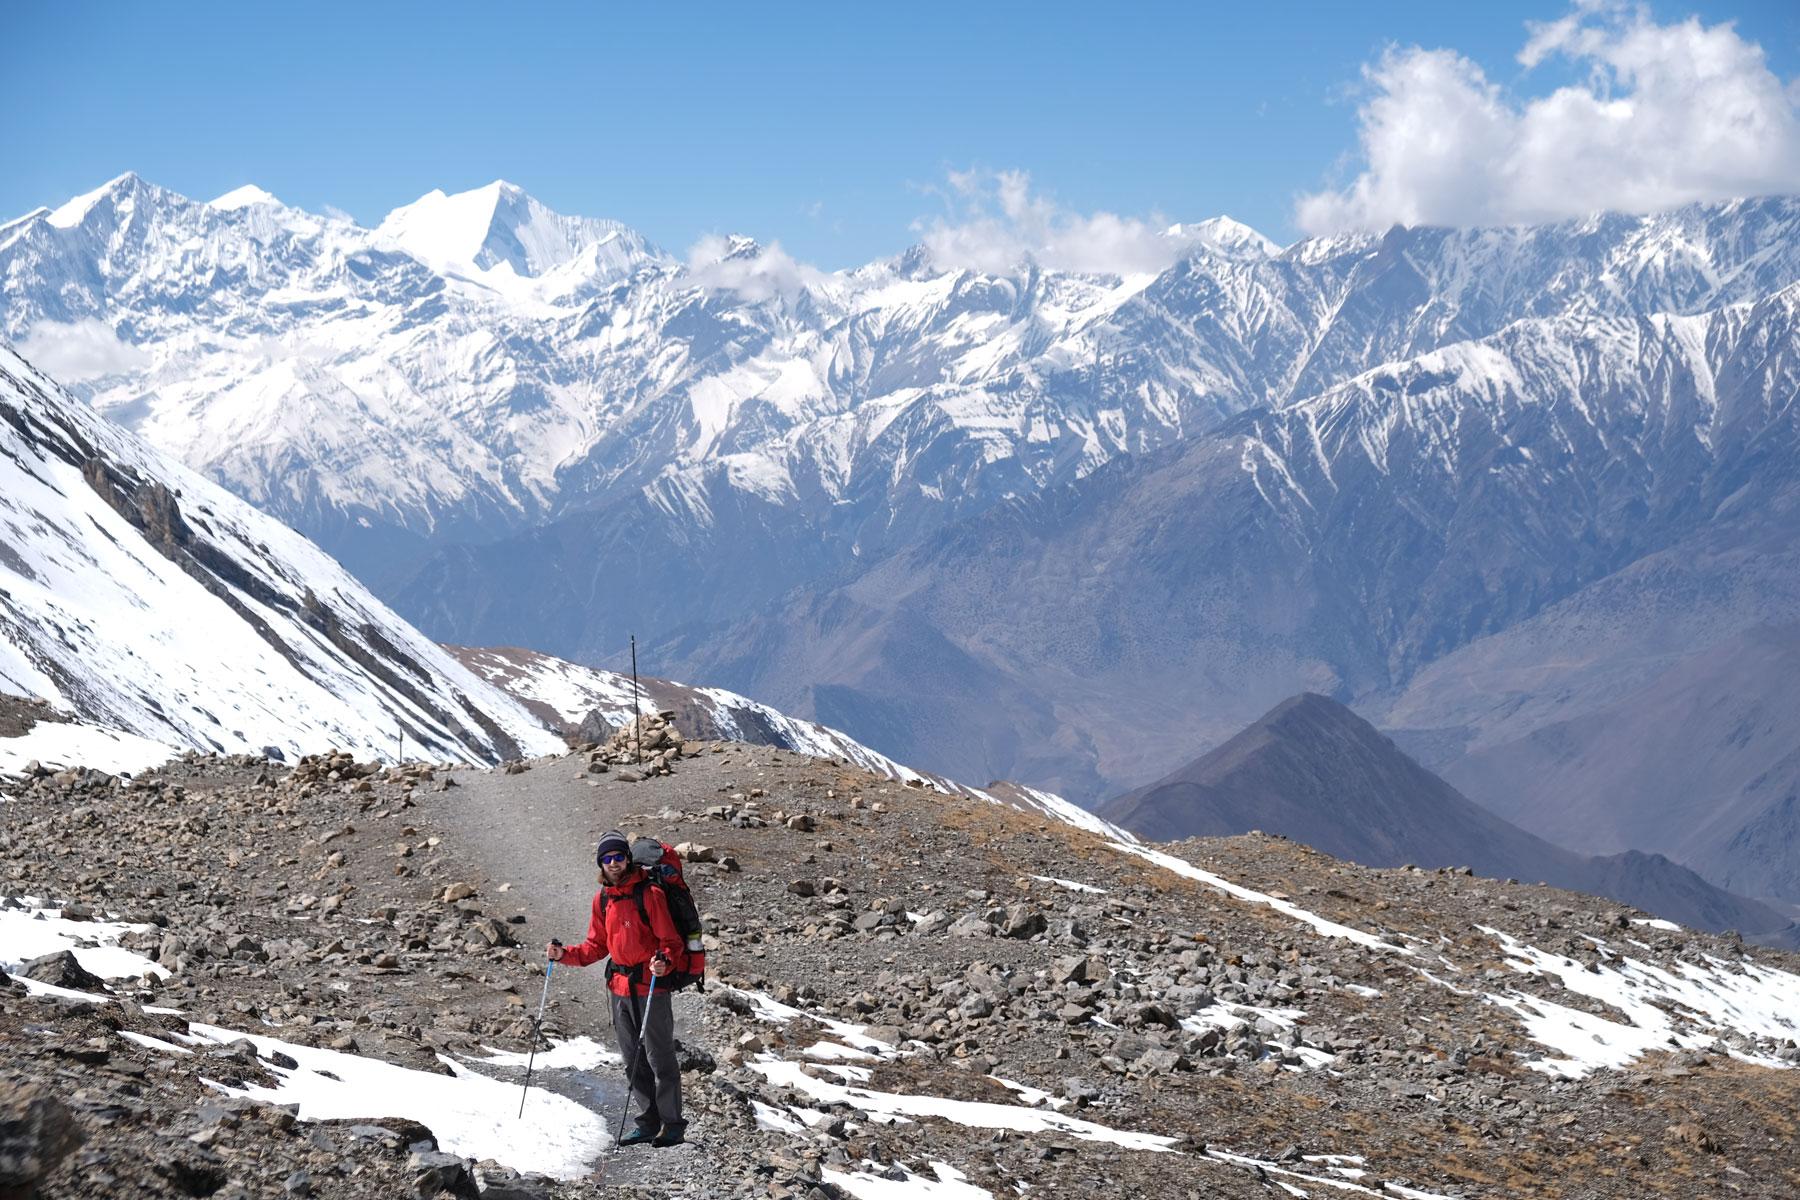 Sebastian beim Abstieg vom Thorong La Pass.